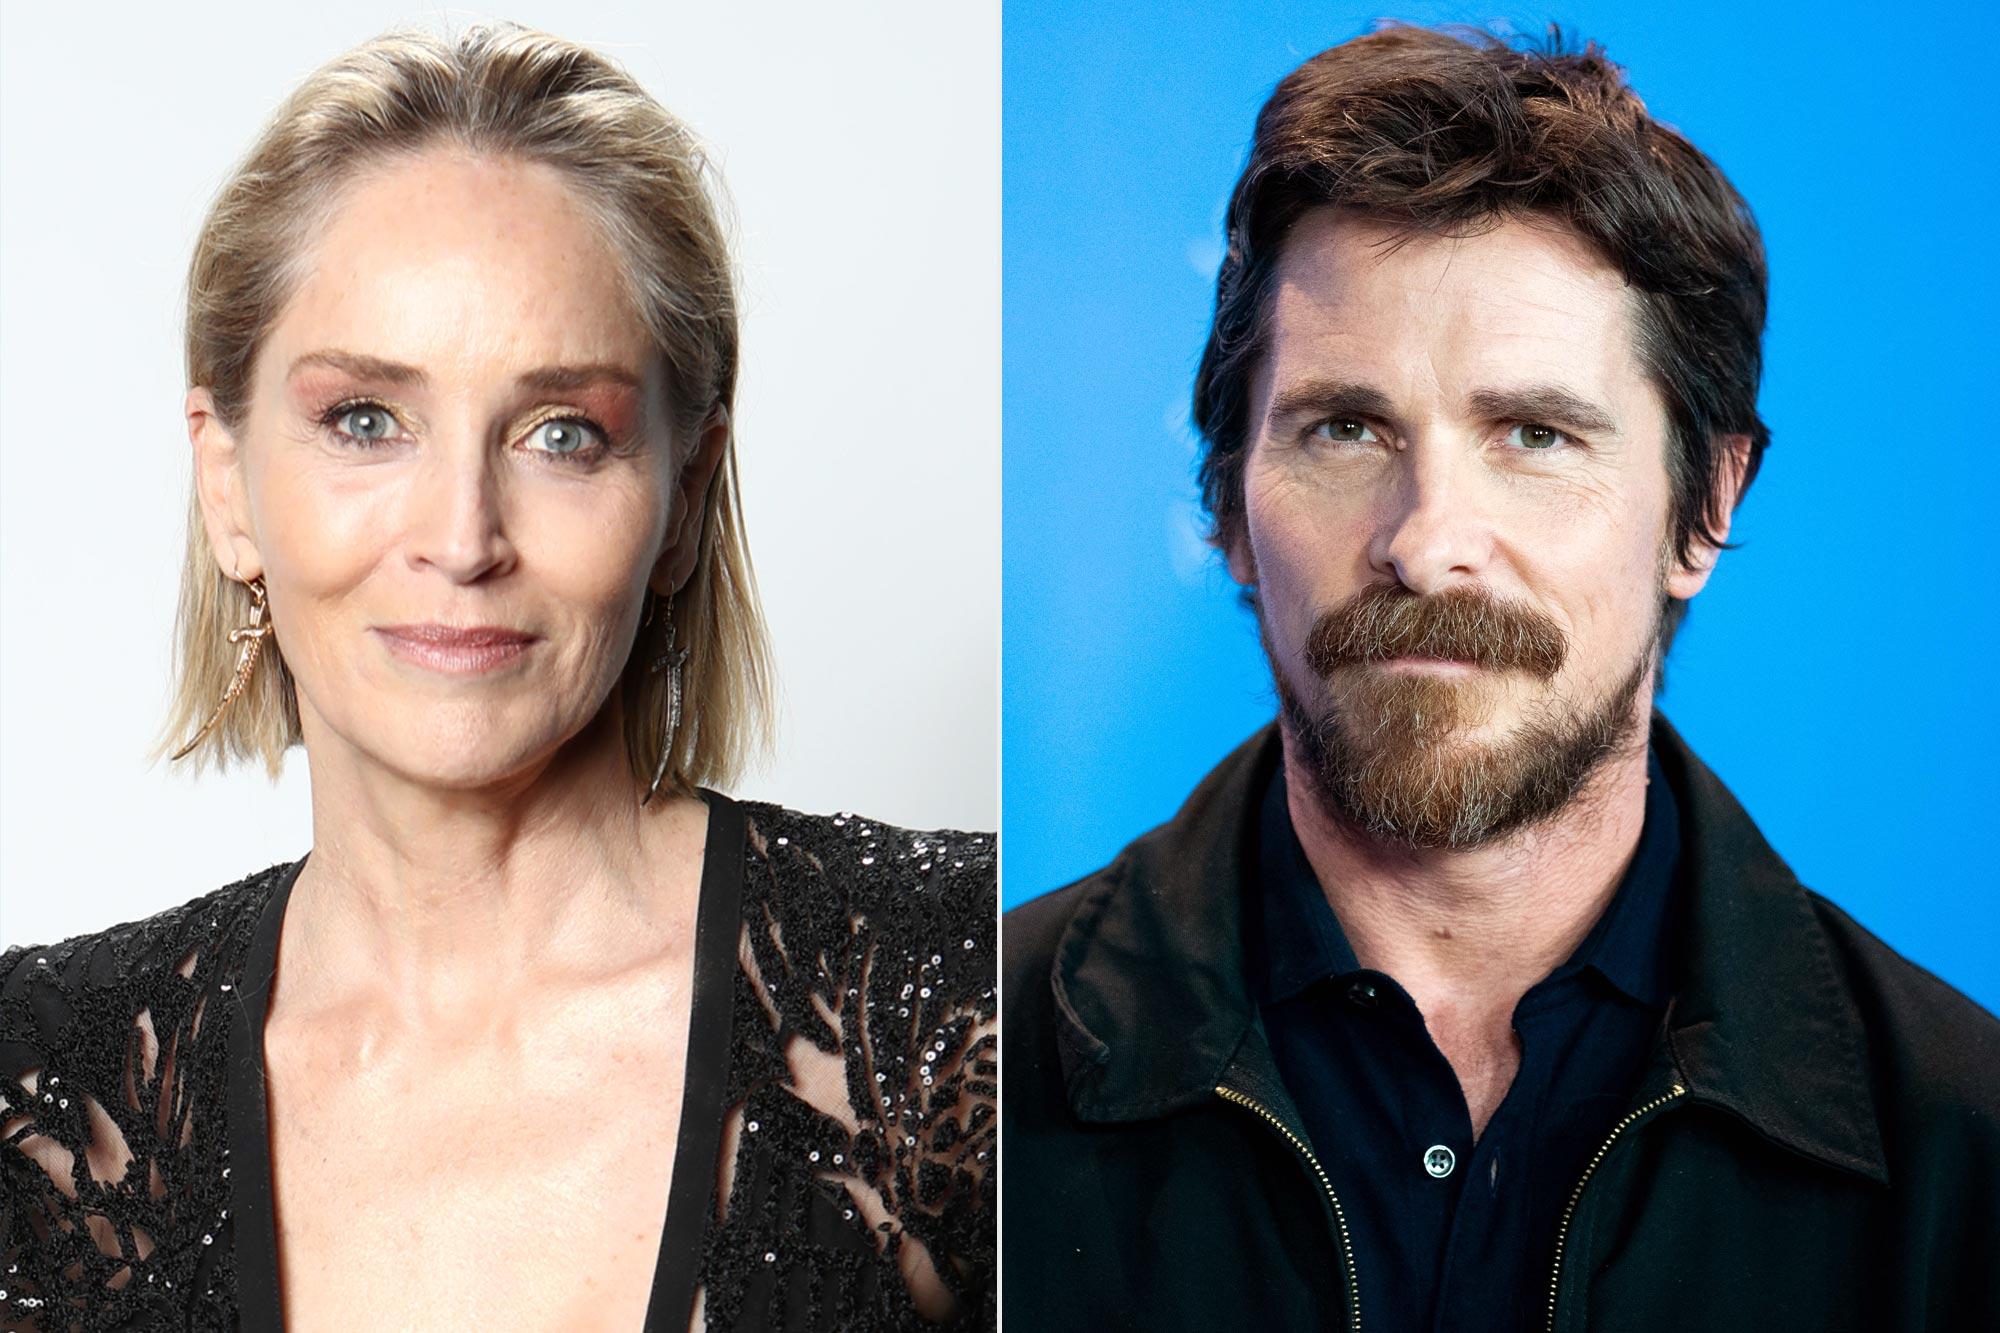 Sharon Stone defends Christian Bale